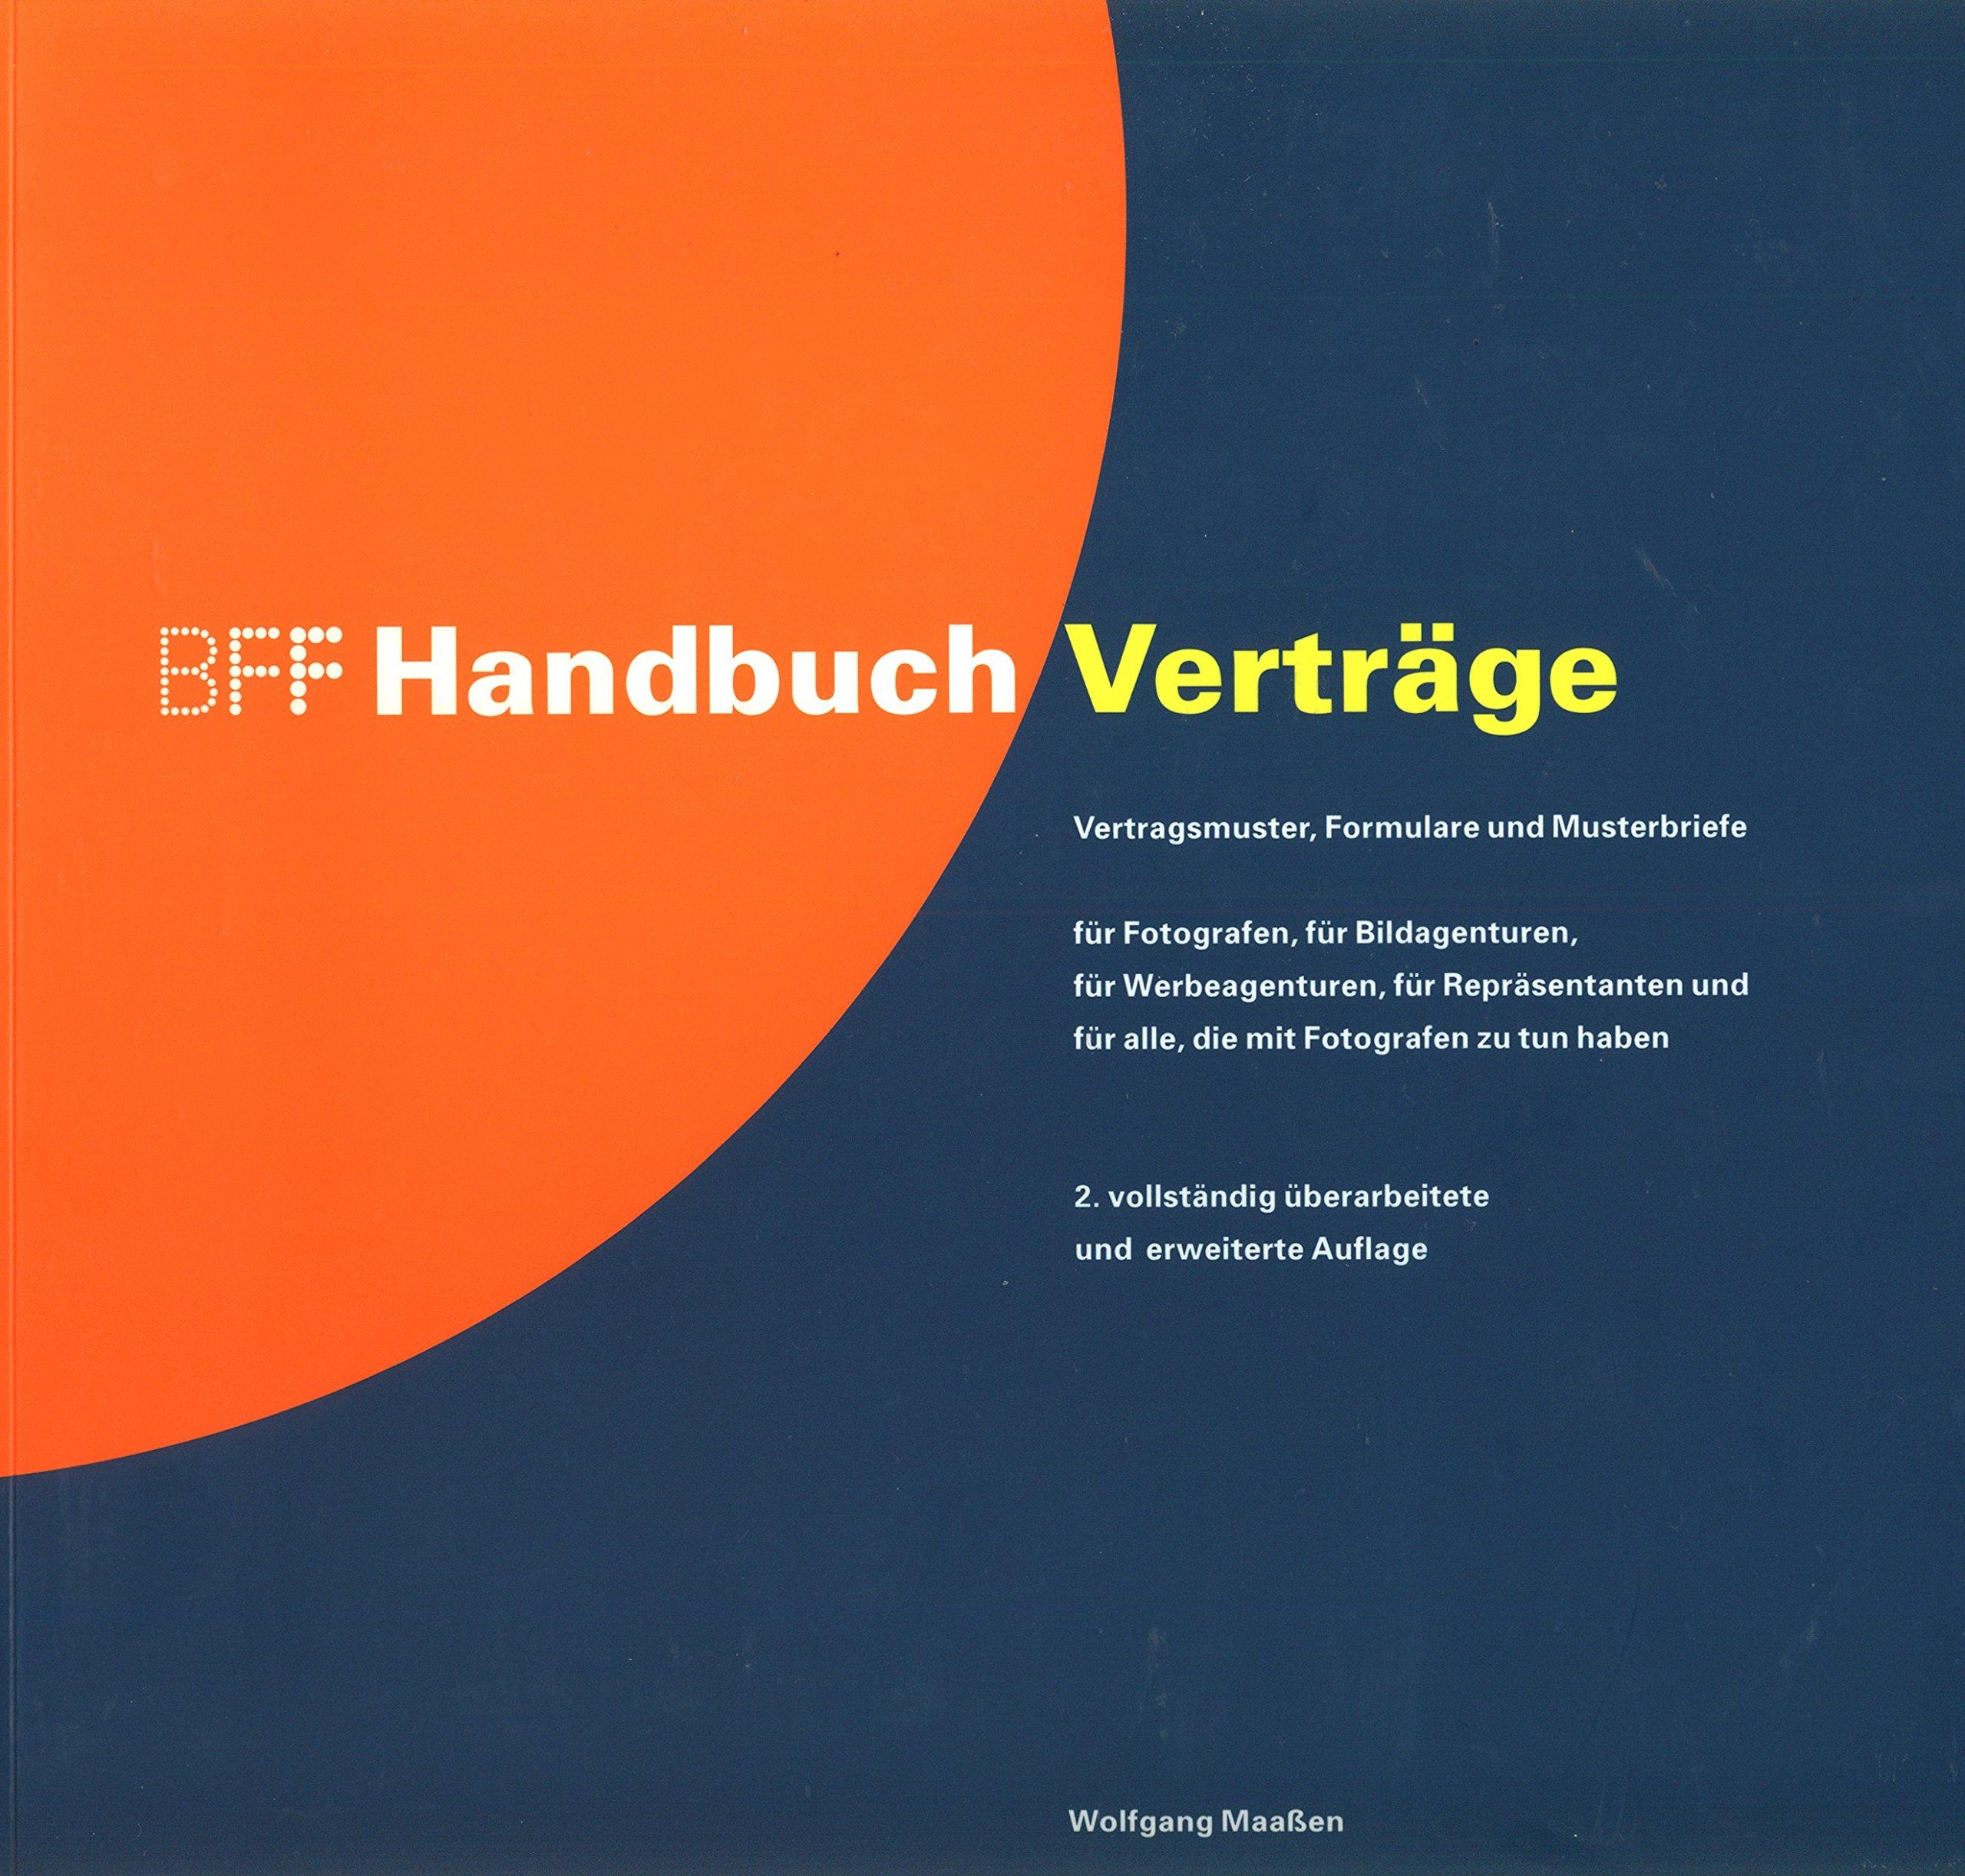 Bff Handbuch Verträge Vertragsmuster Formular Musterverträge Für